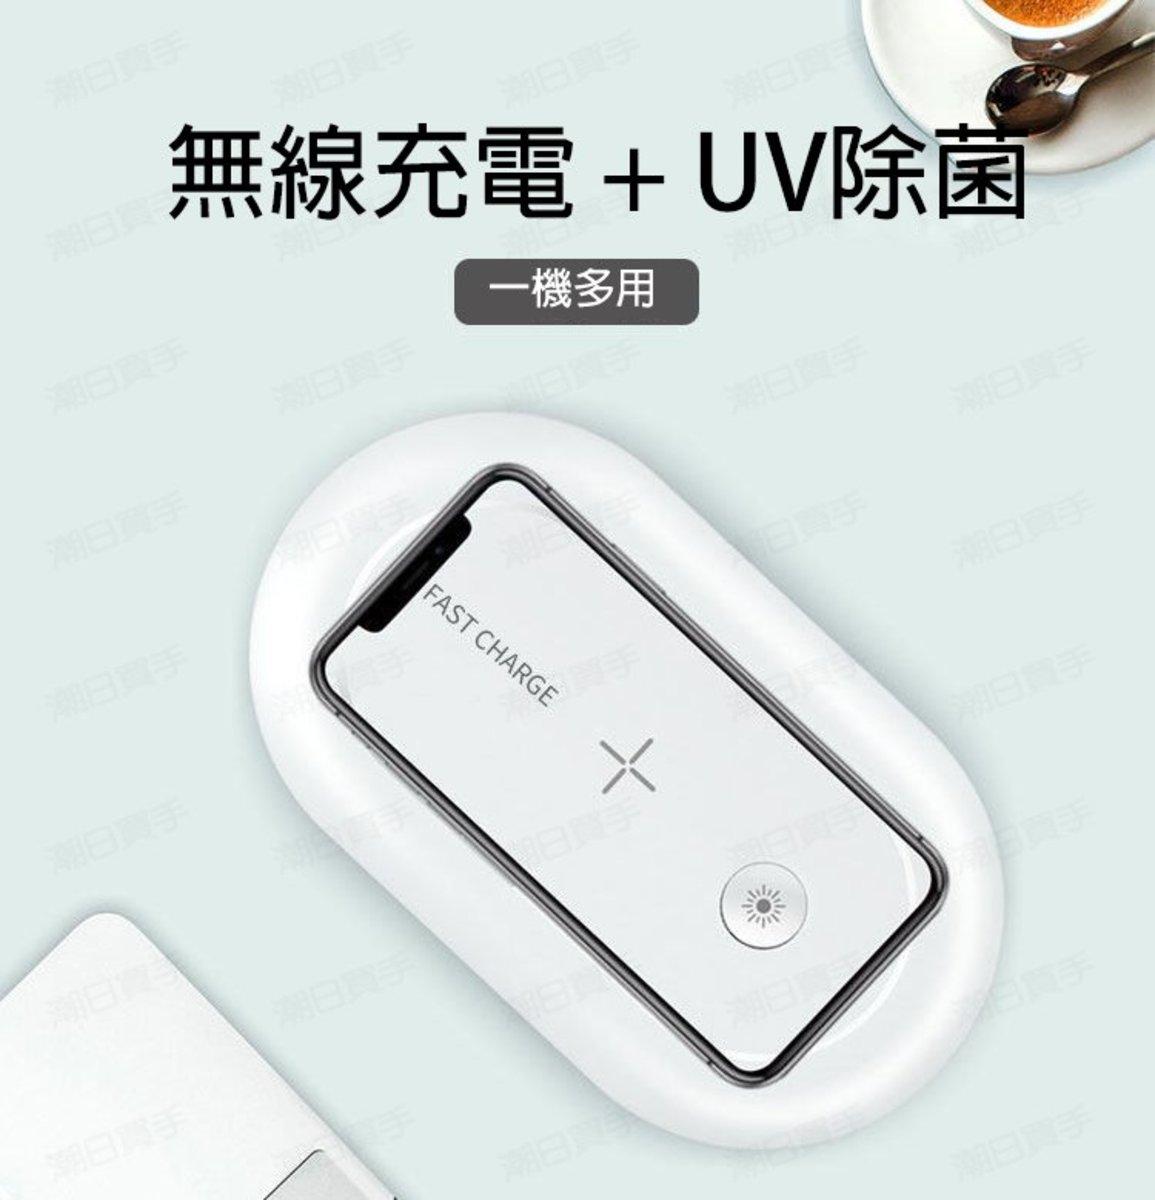 UV Sterilization Box/Wireless Charging